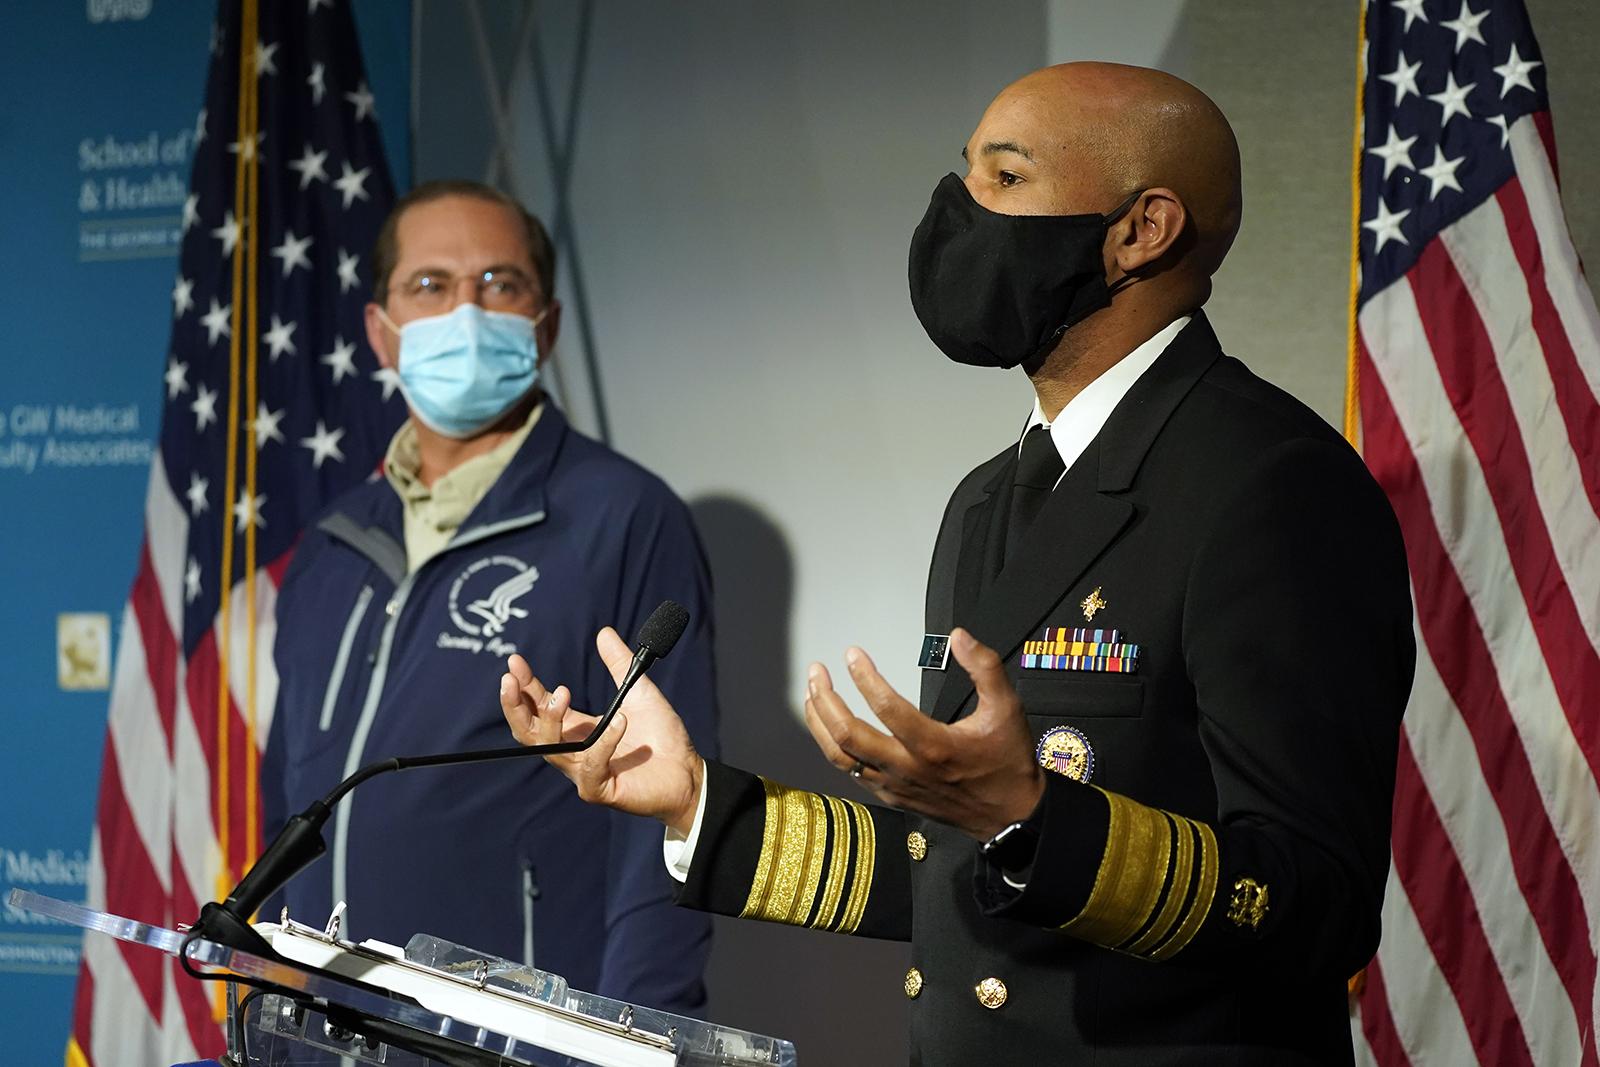 U.S. Surgeon General Dr. Jerome Adams speaks at George Washington University Hospital on Monday, December 14, in Washington.